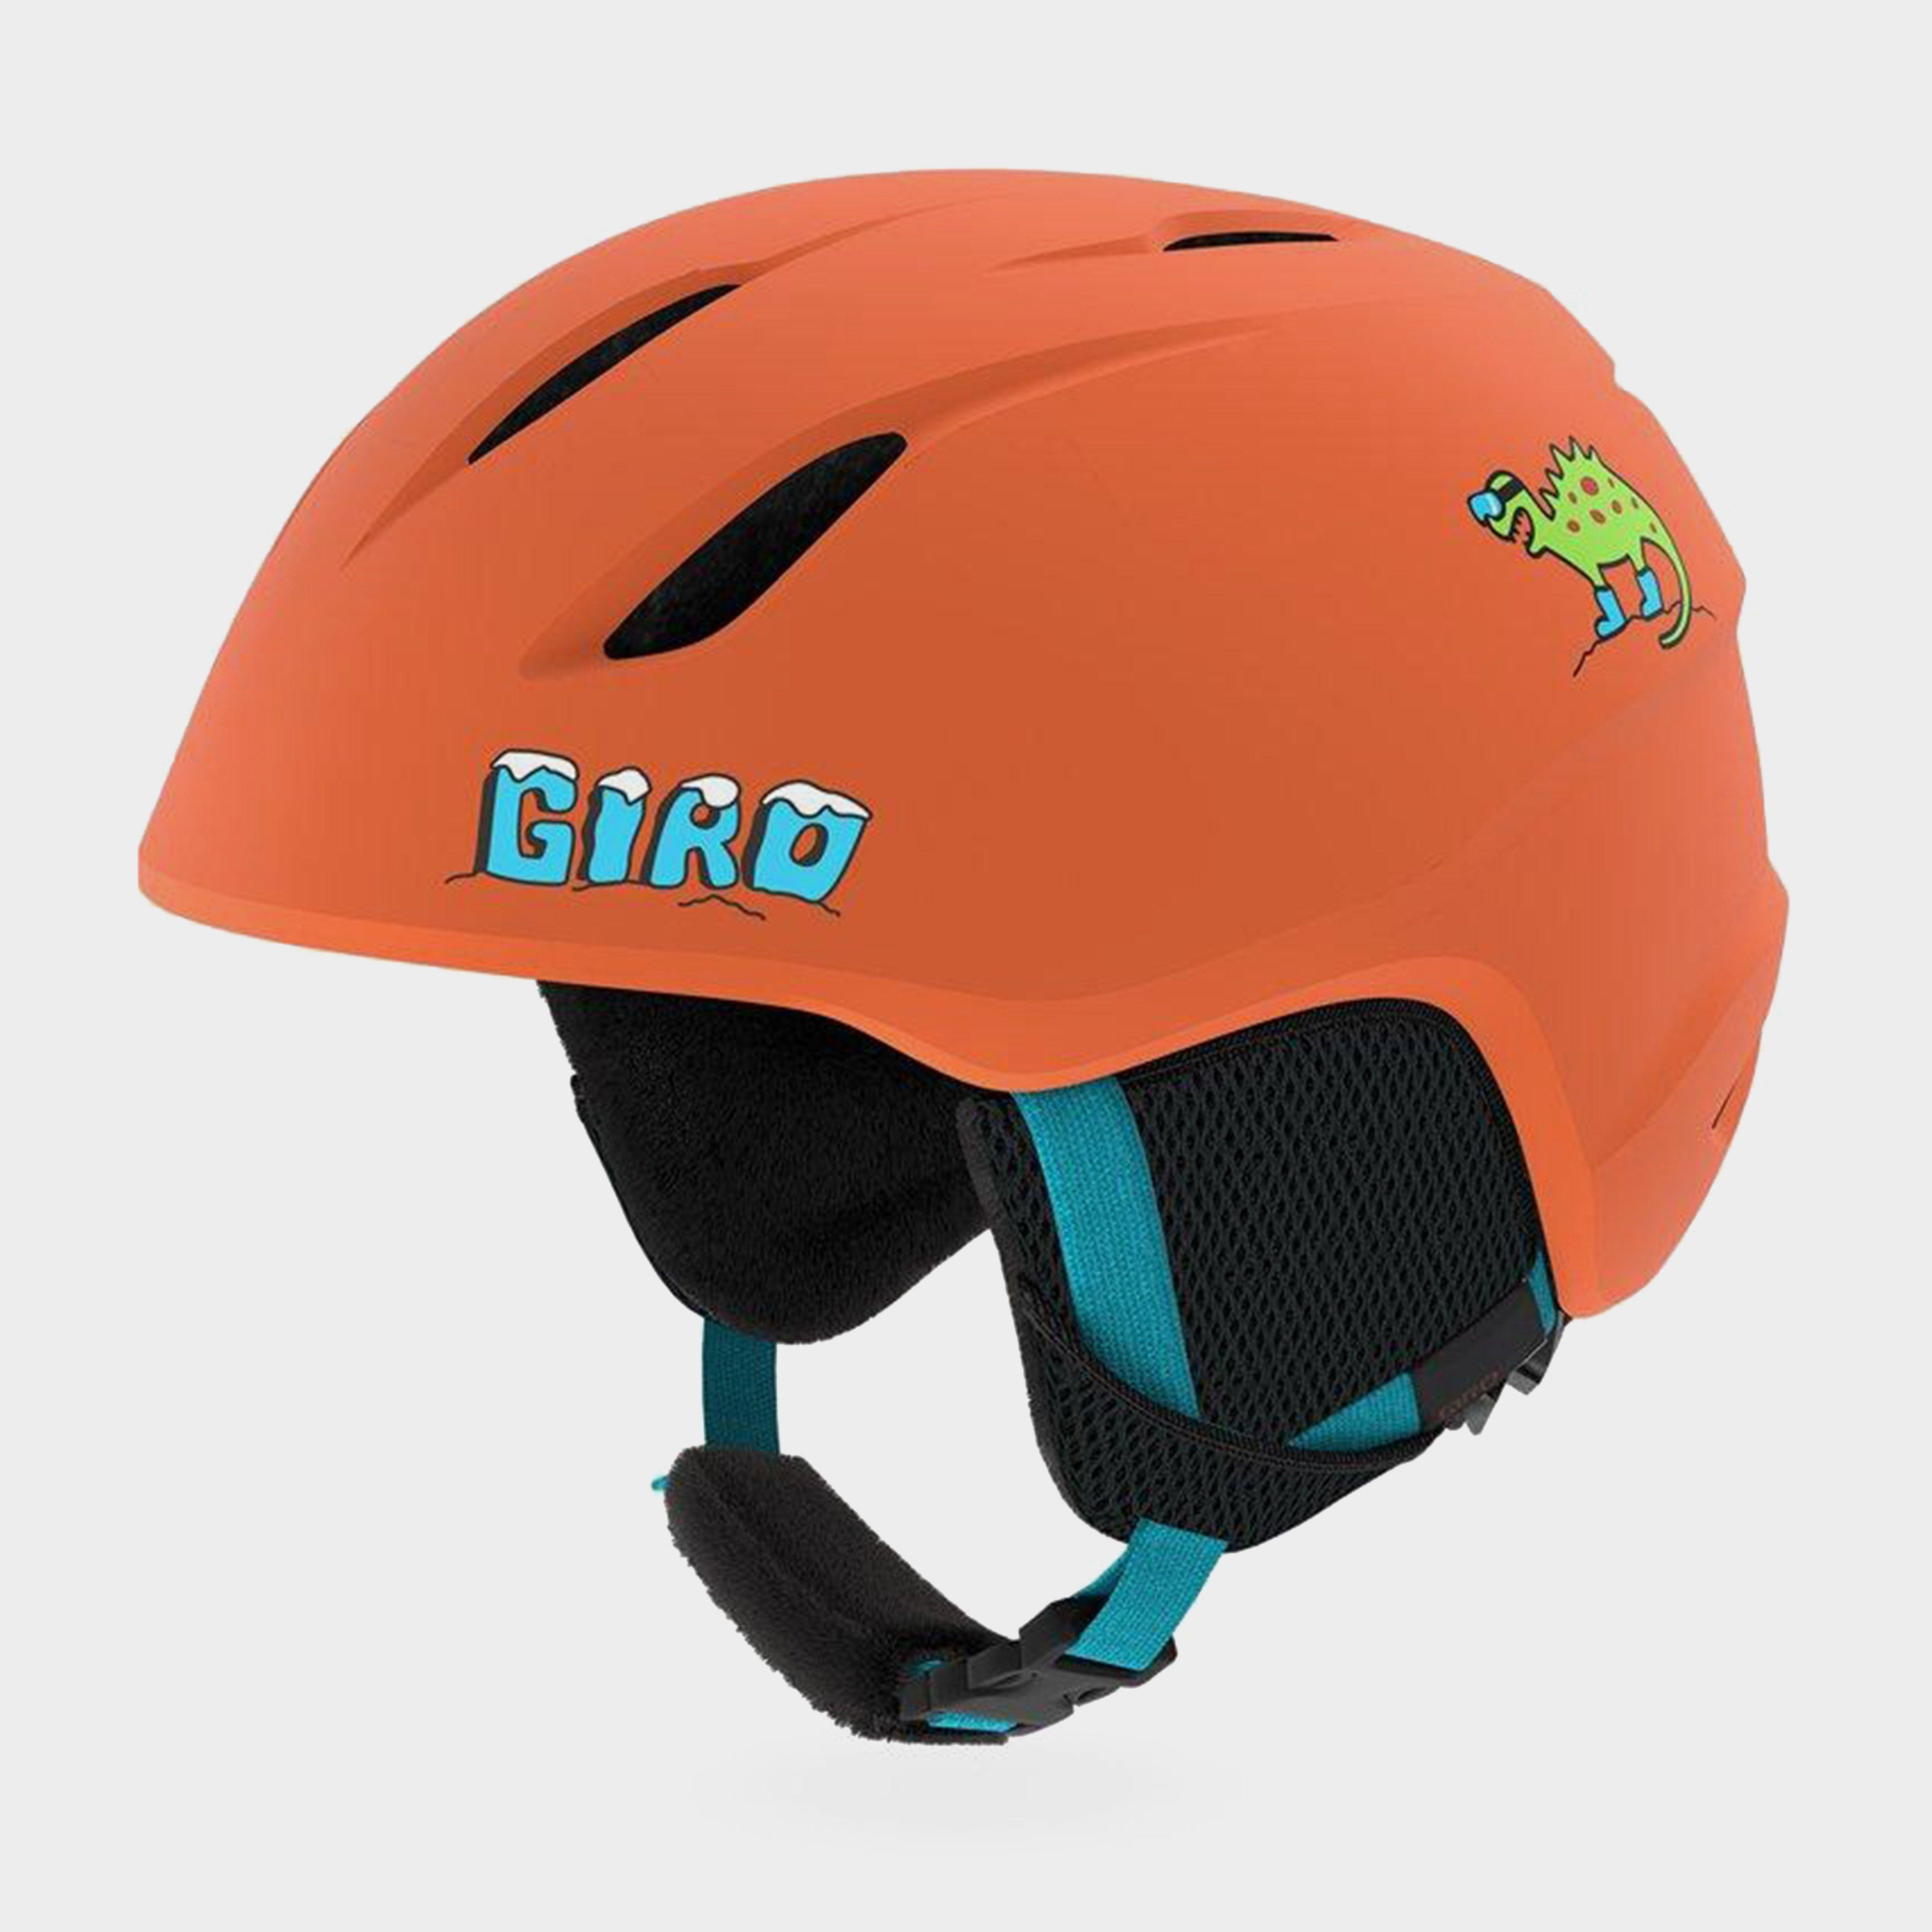 Giro Kids' Launch Snow Helmet - Orange/Org, Orange